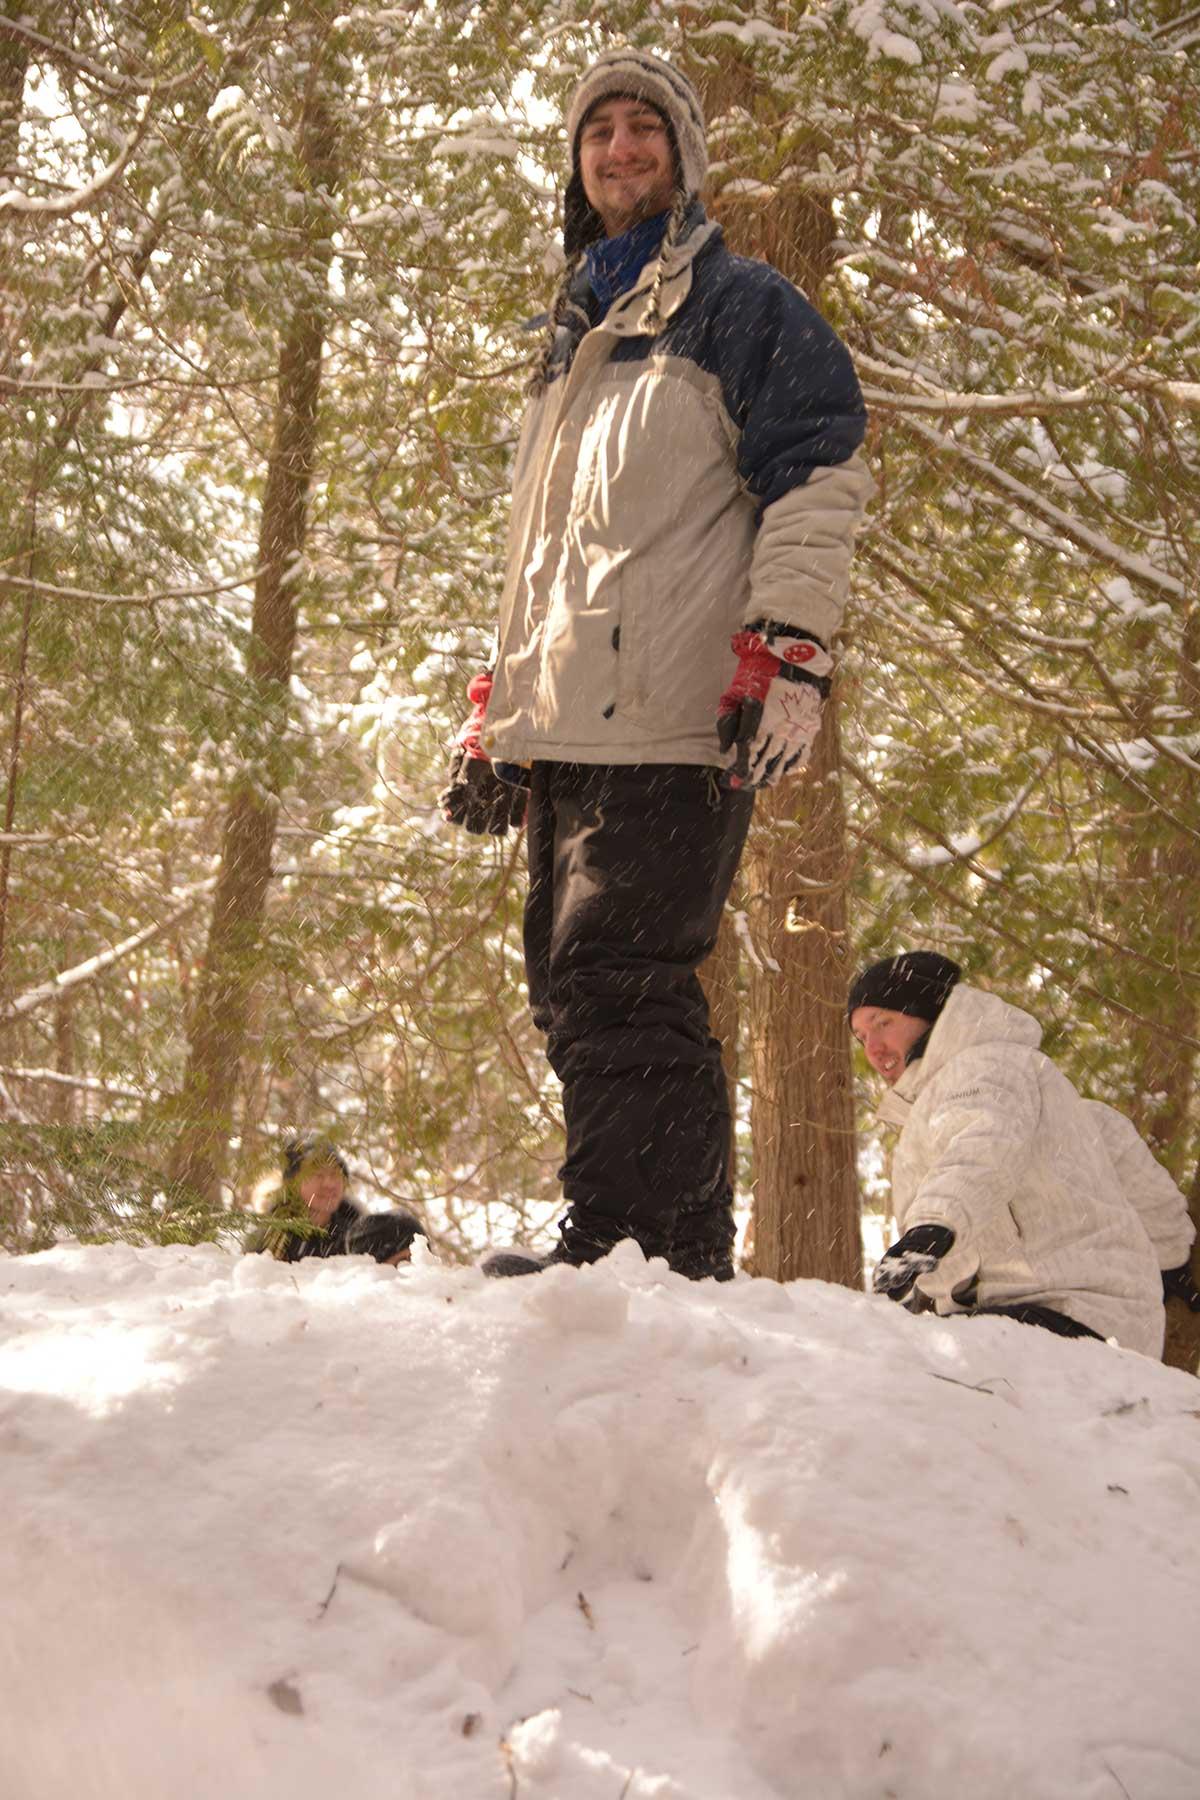 Winter-Camping-Feb-17-19,-2015-169.jpg